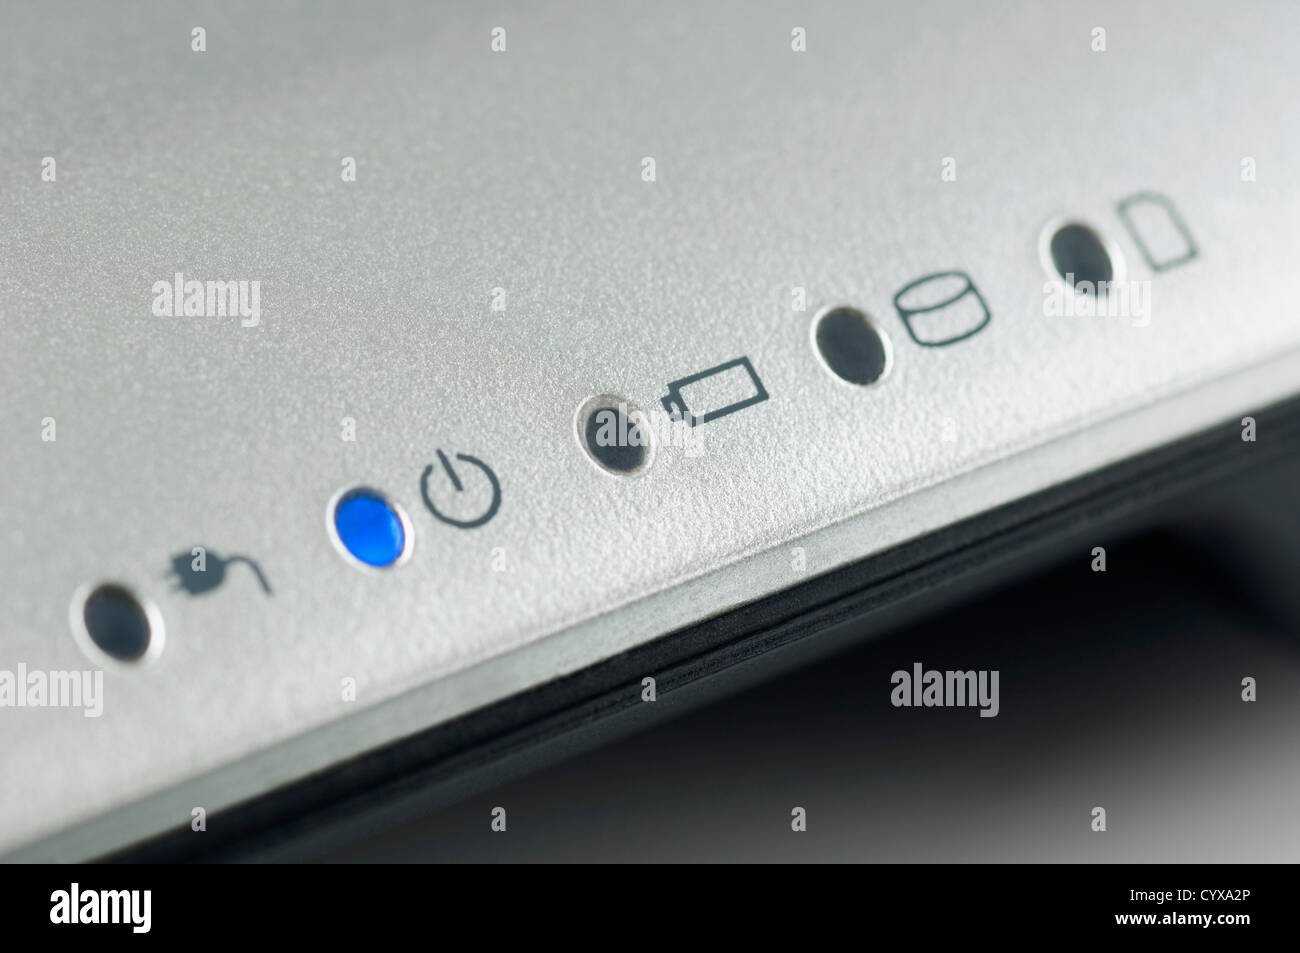 Close-up of indicators of a laptop - Stock Image